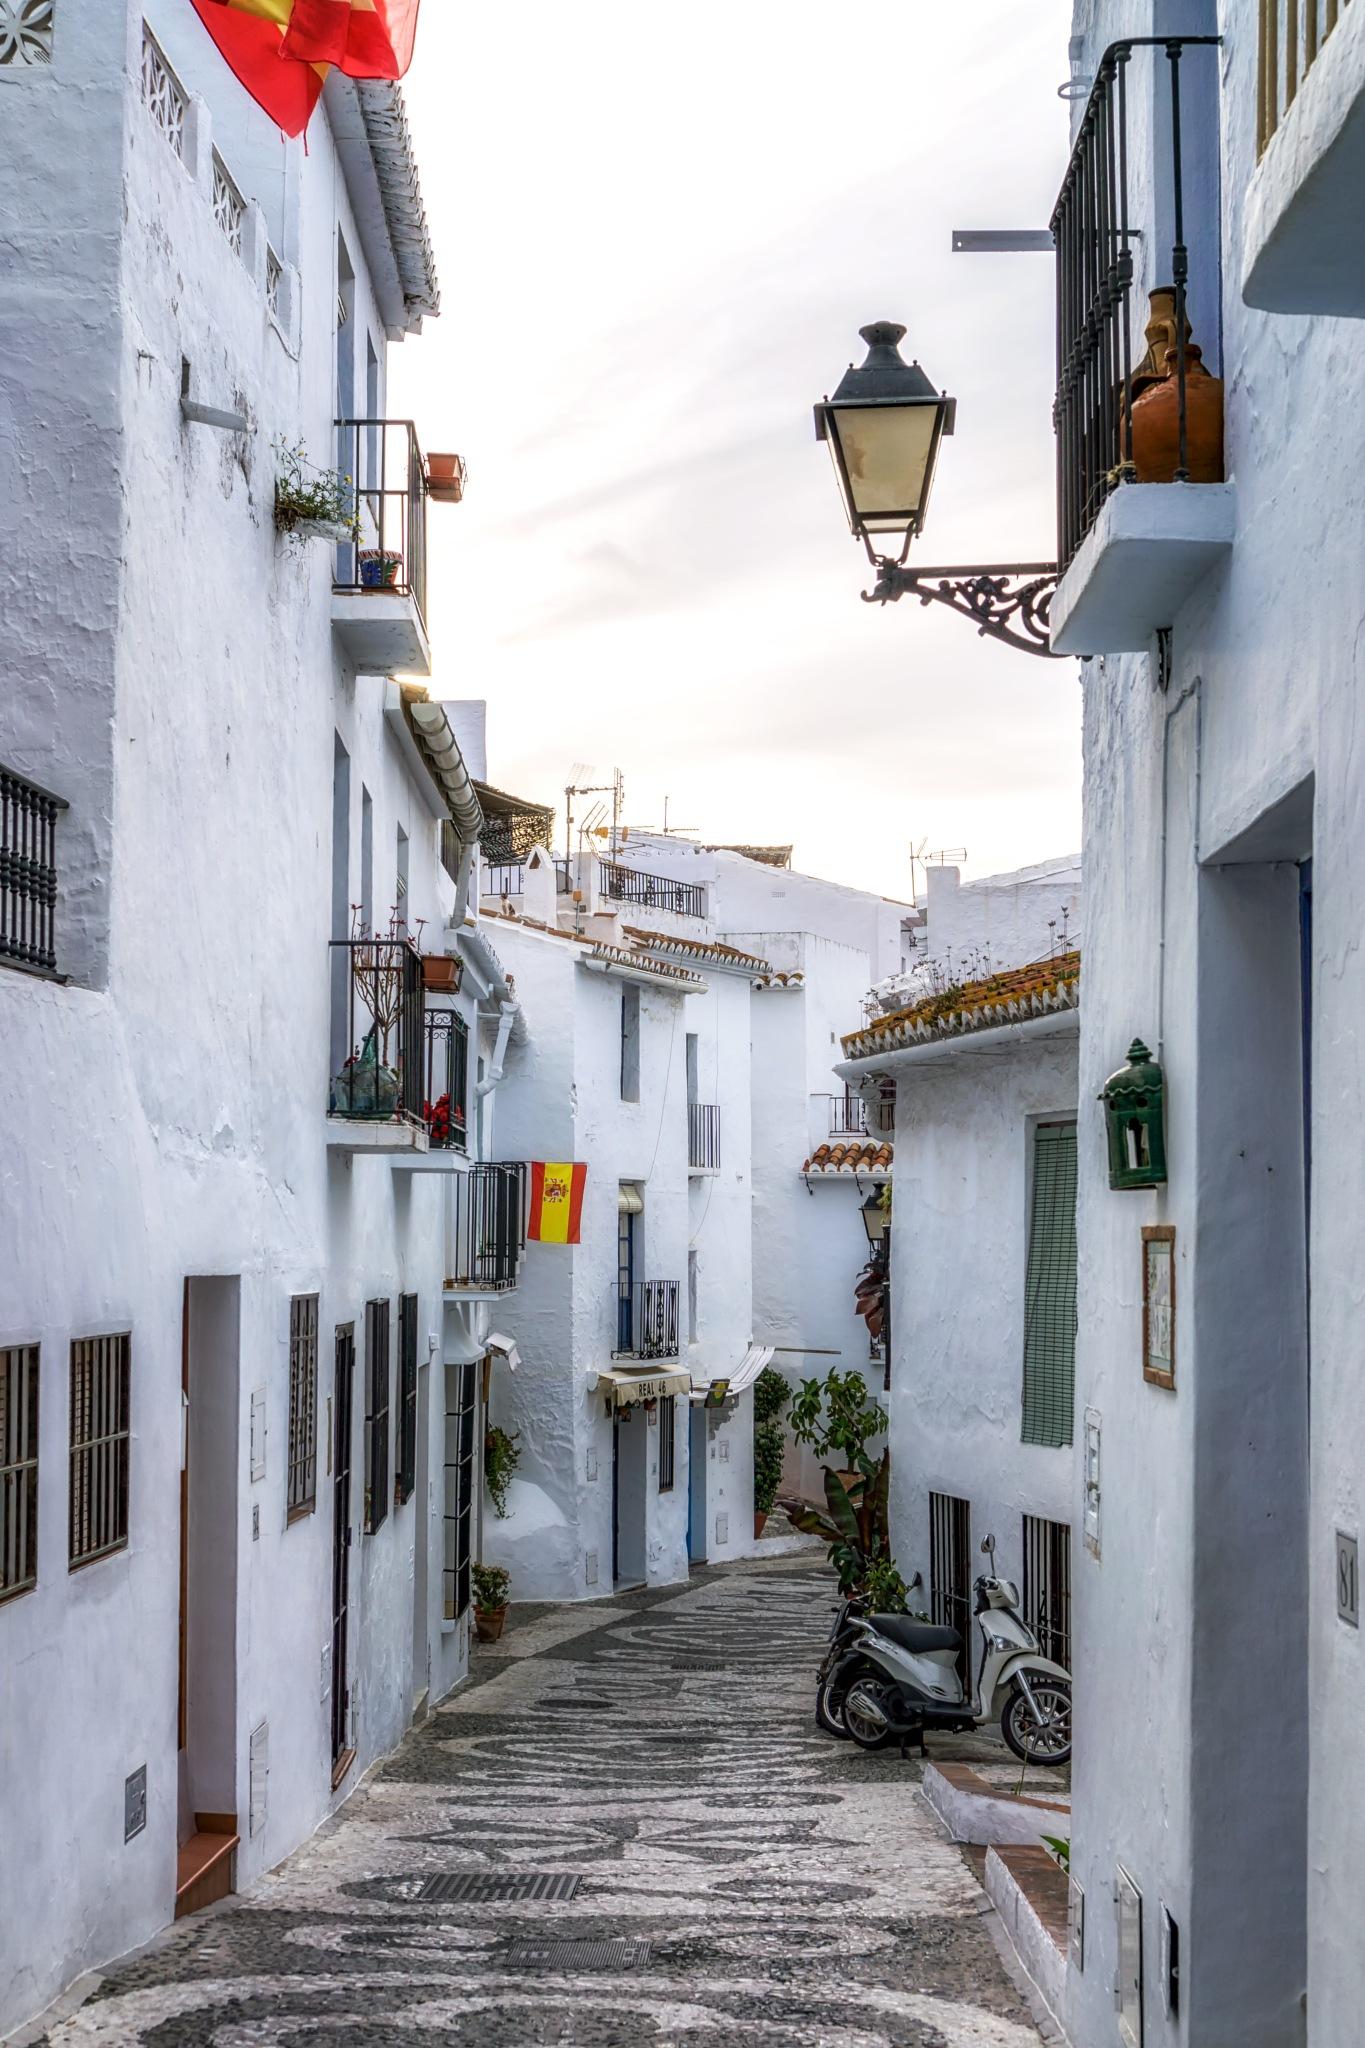 Alleyways of Frigiliana by Aaron Choi